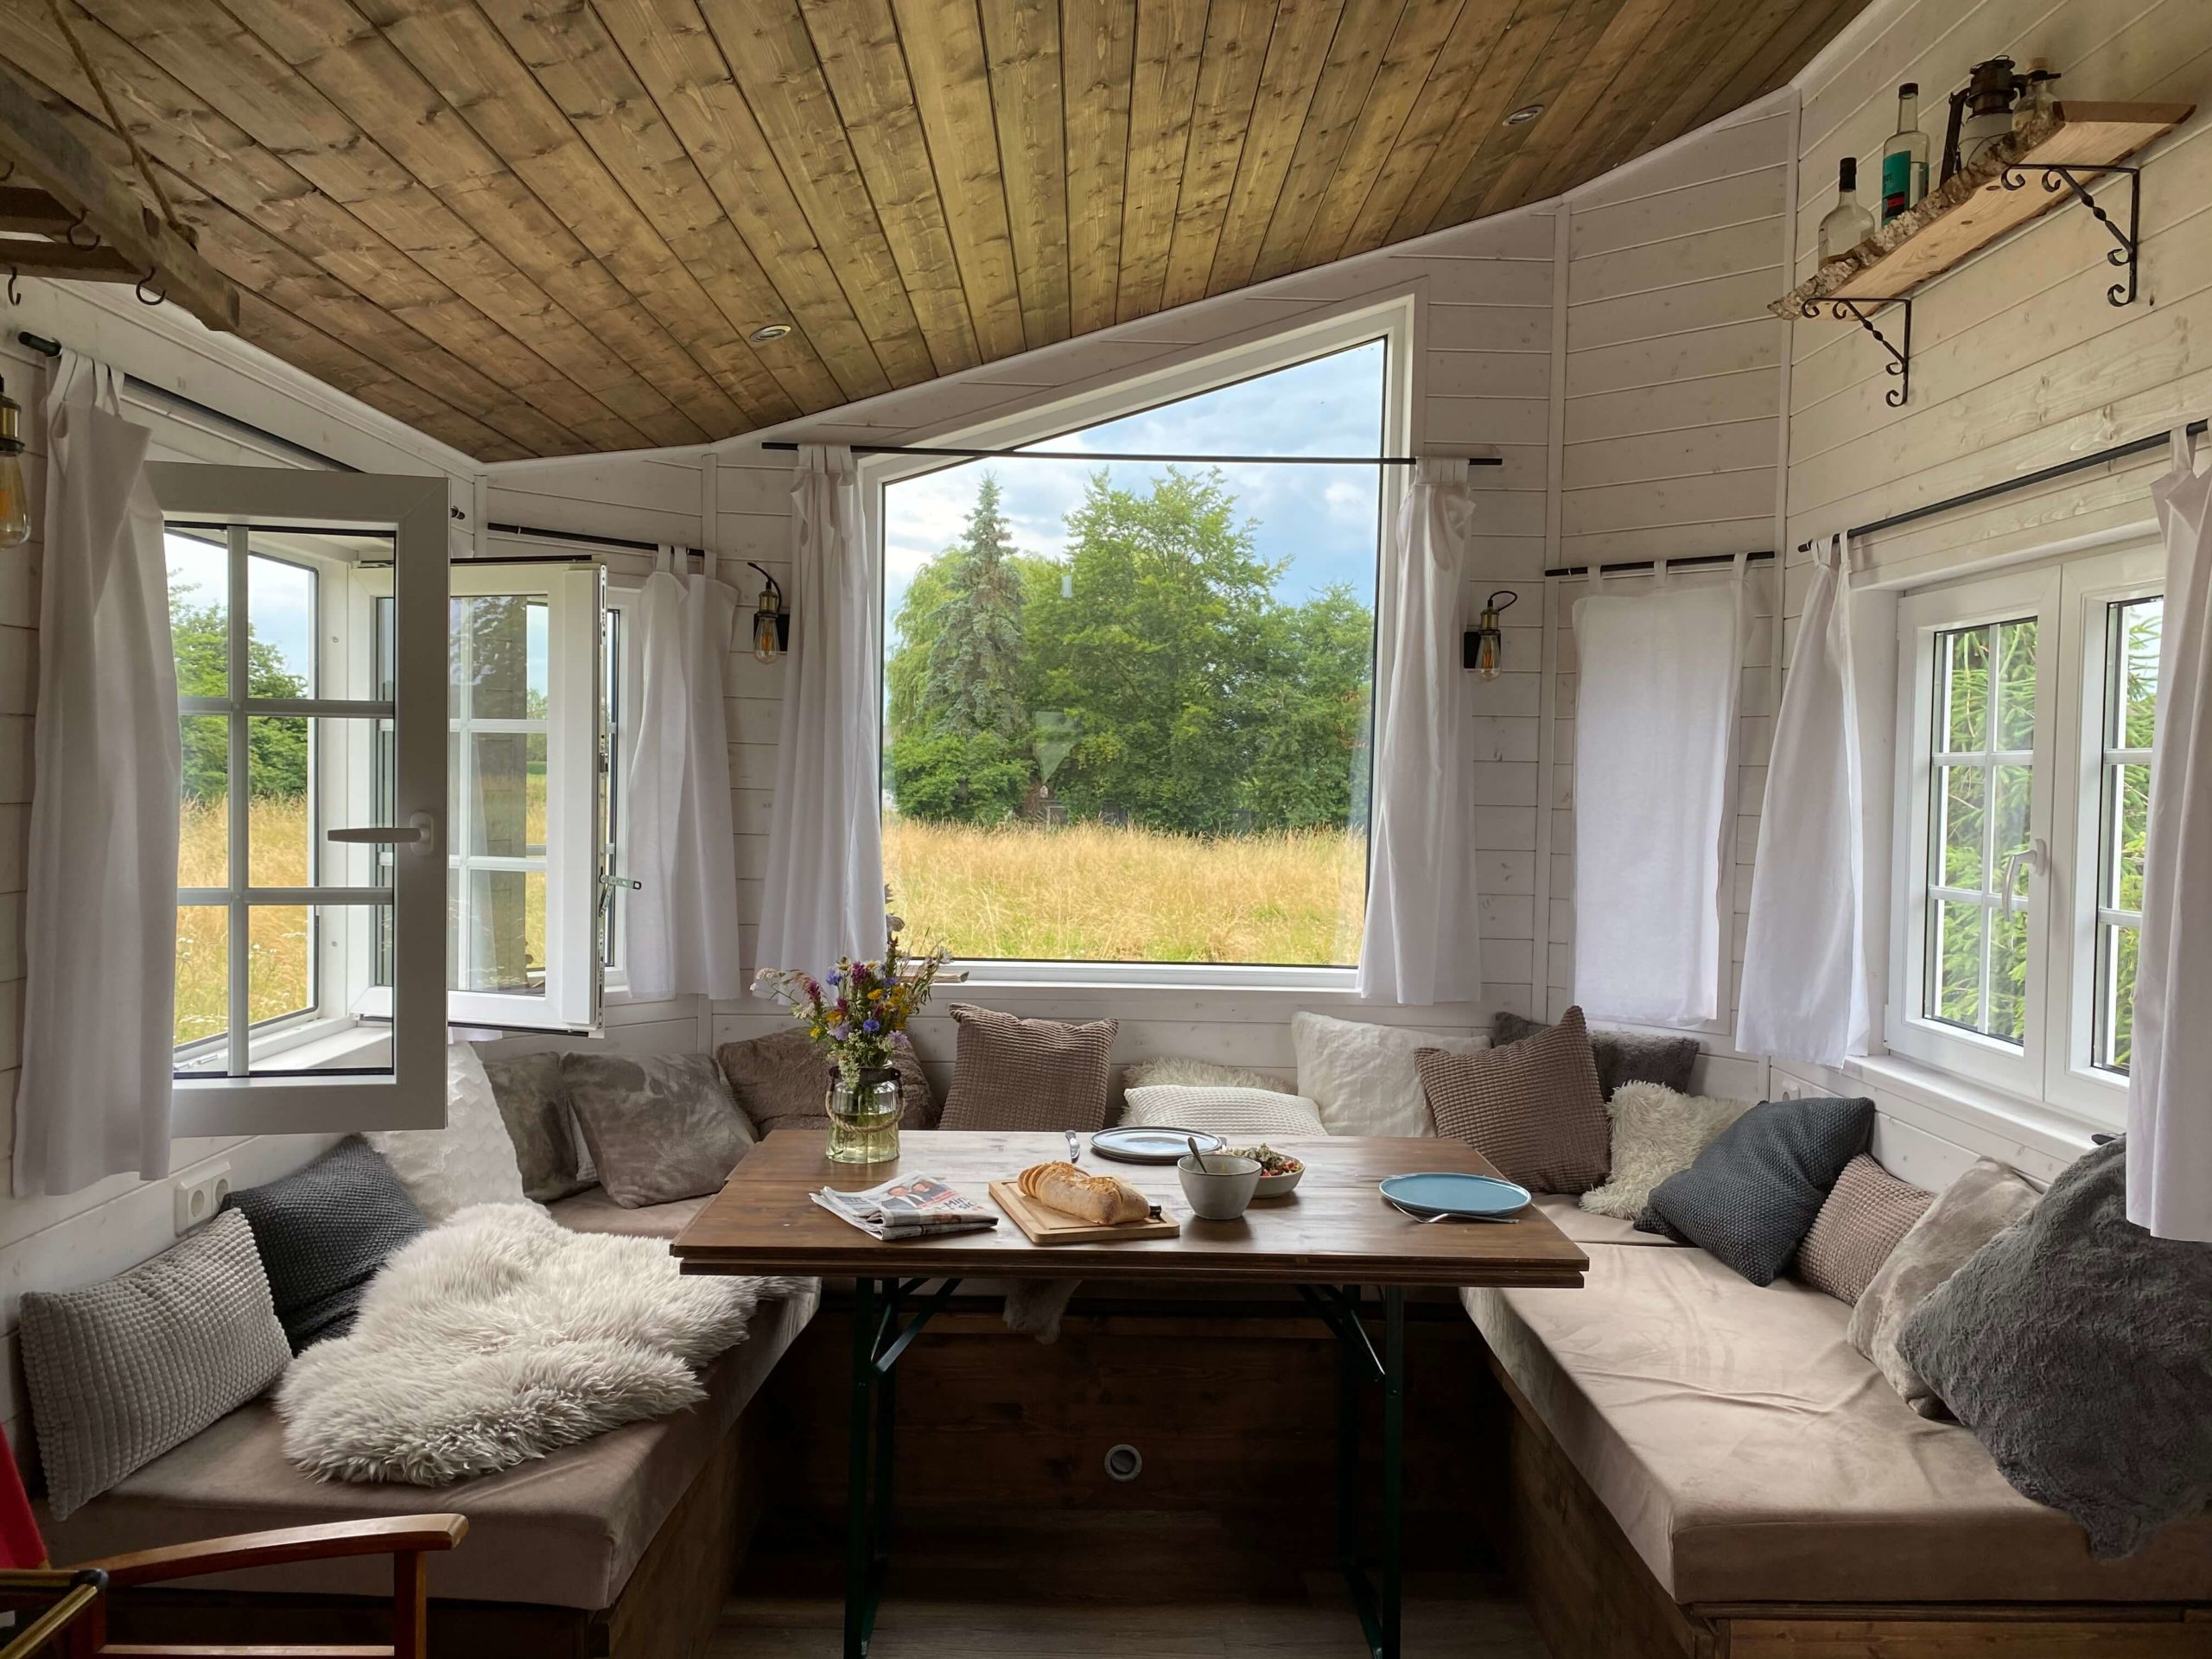 mobiles-tiny-house-lappland-vital-camp-gmbh-09